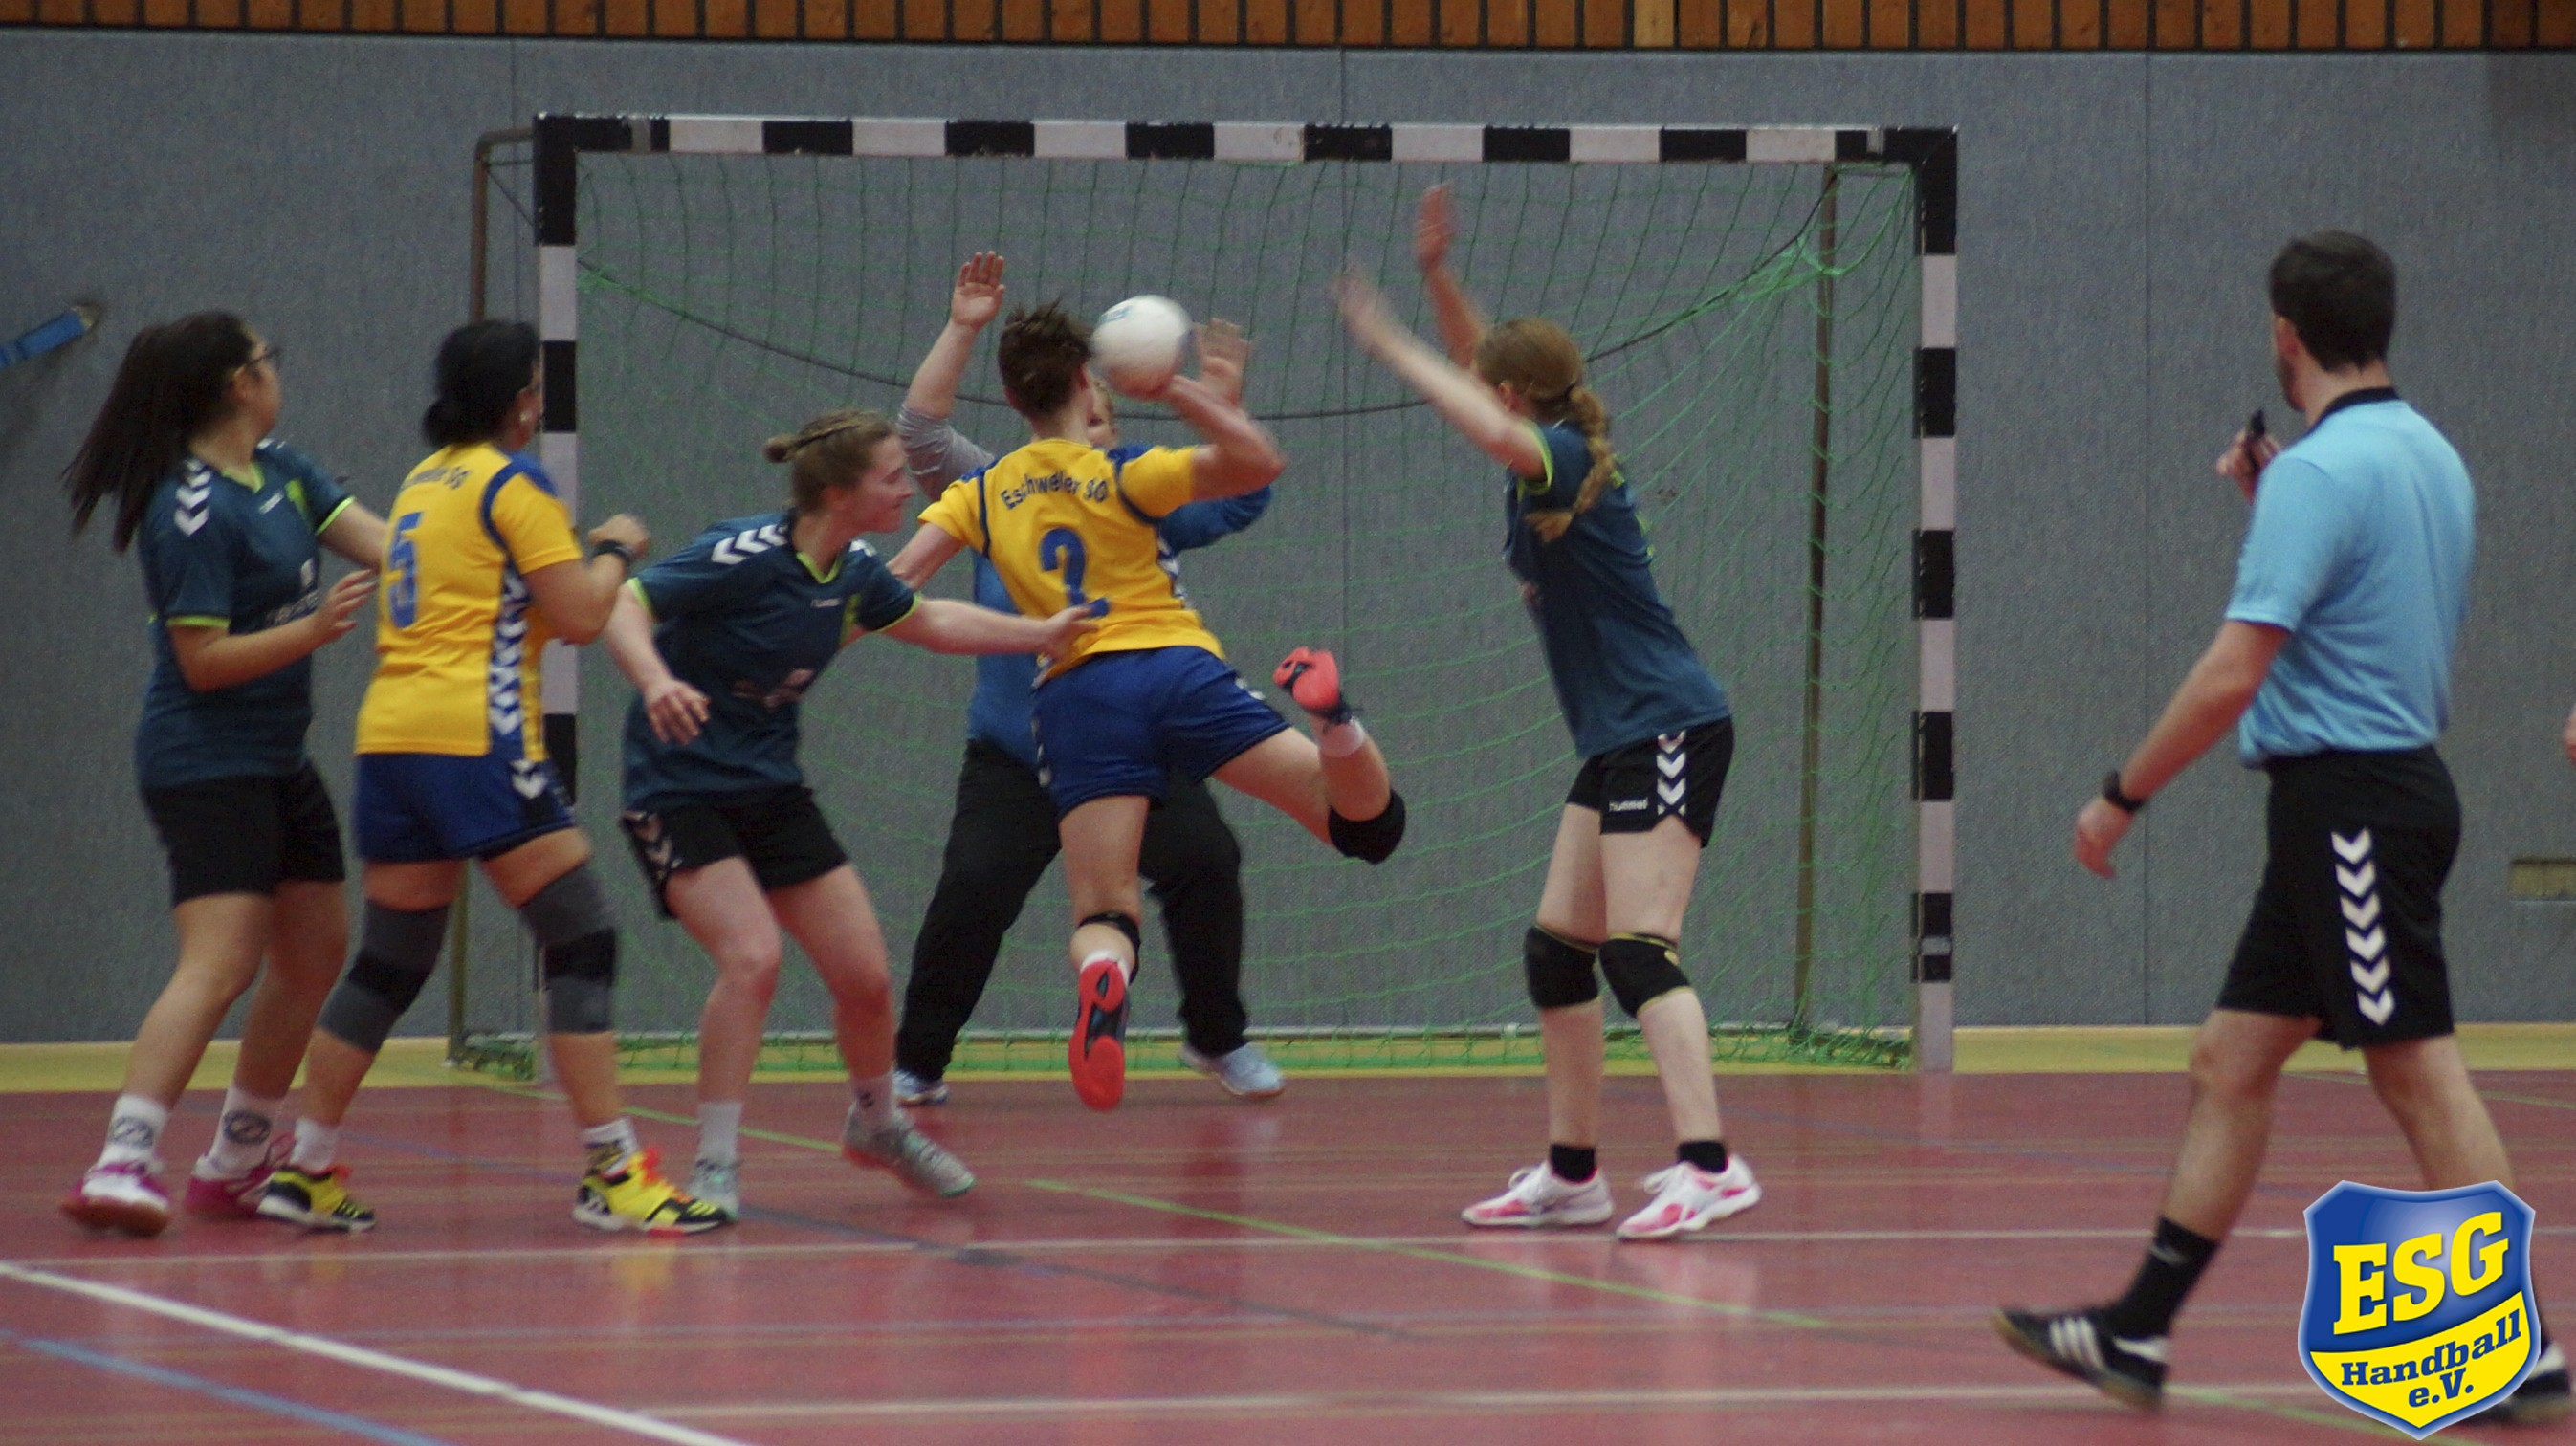 ESG Handball-Cup 2019